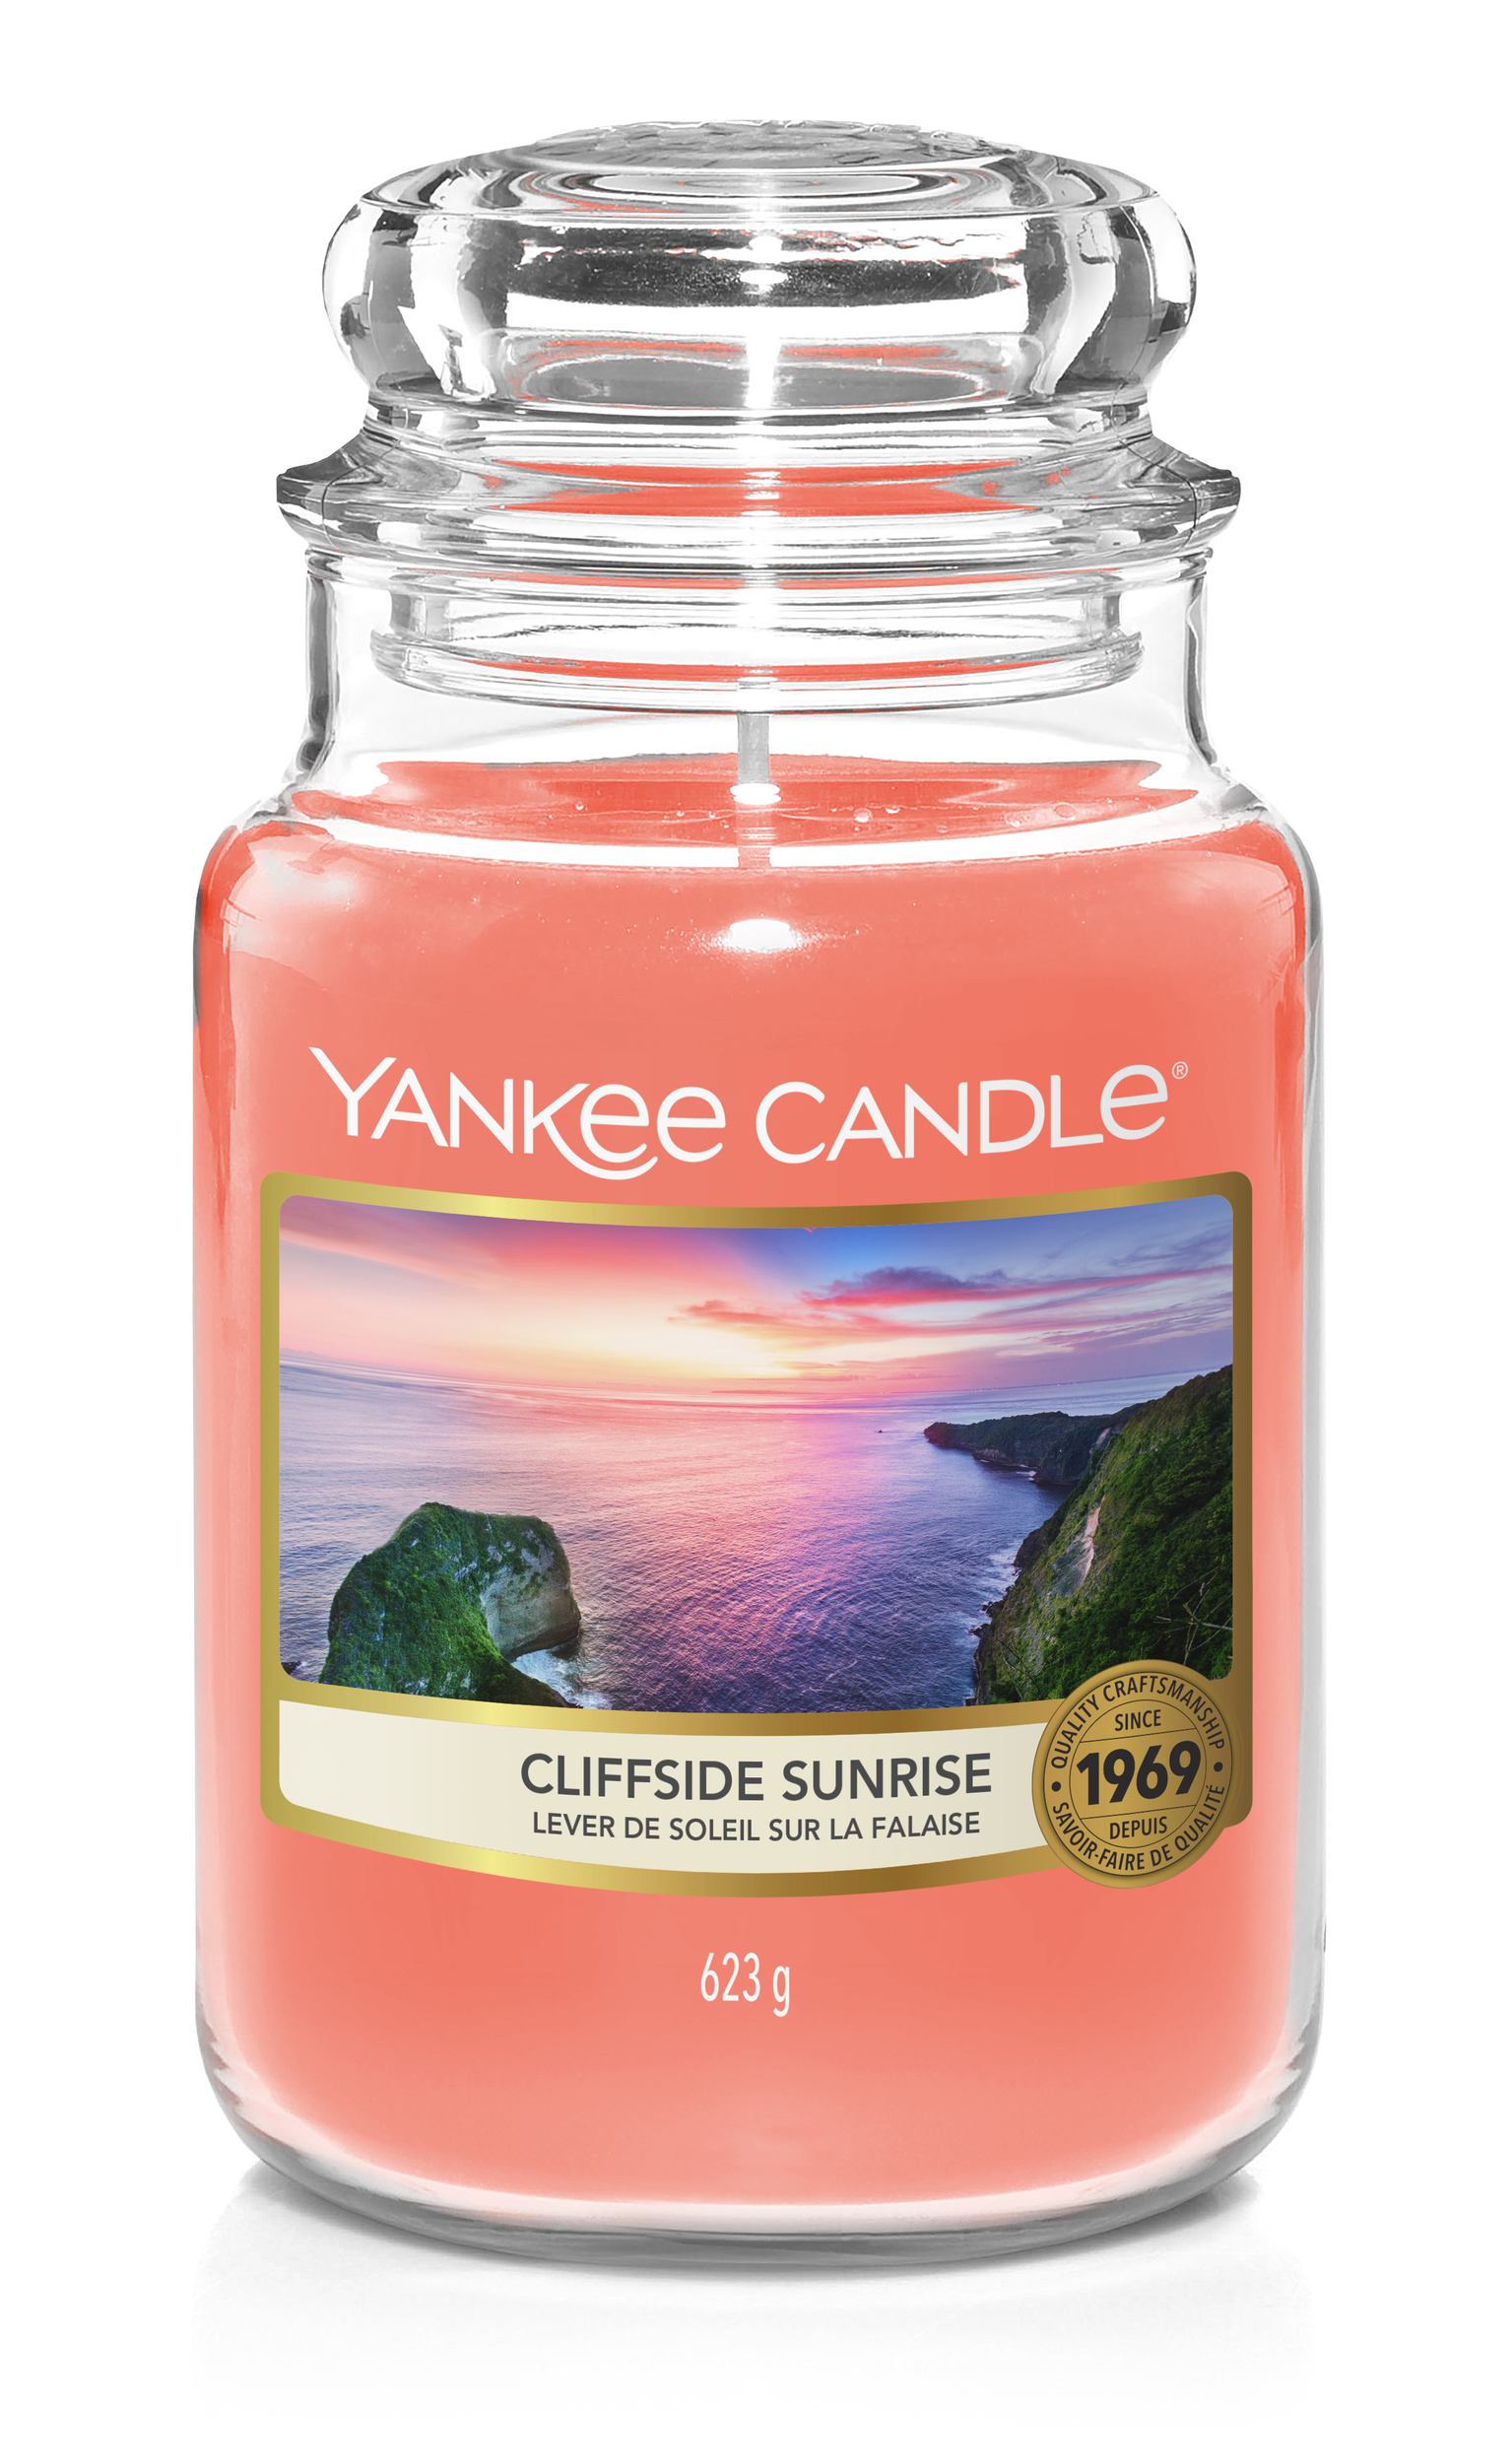 Bougie Cliffside Sunrise grande jarre - Yankee Candle